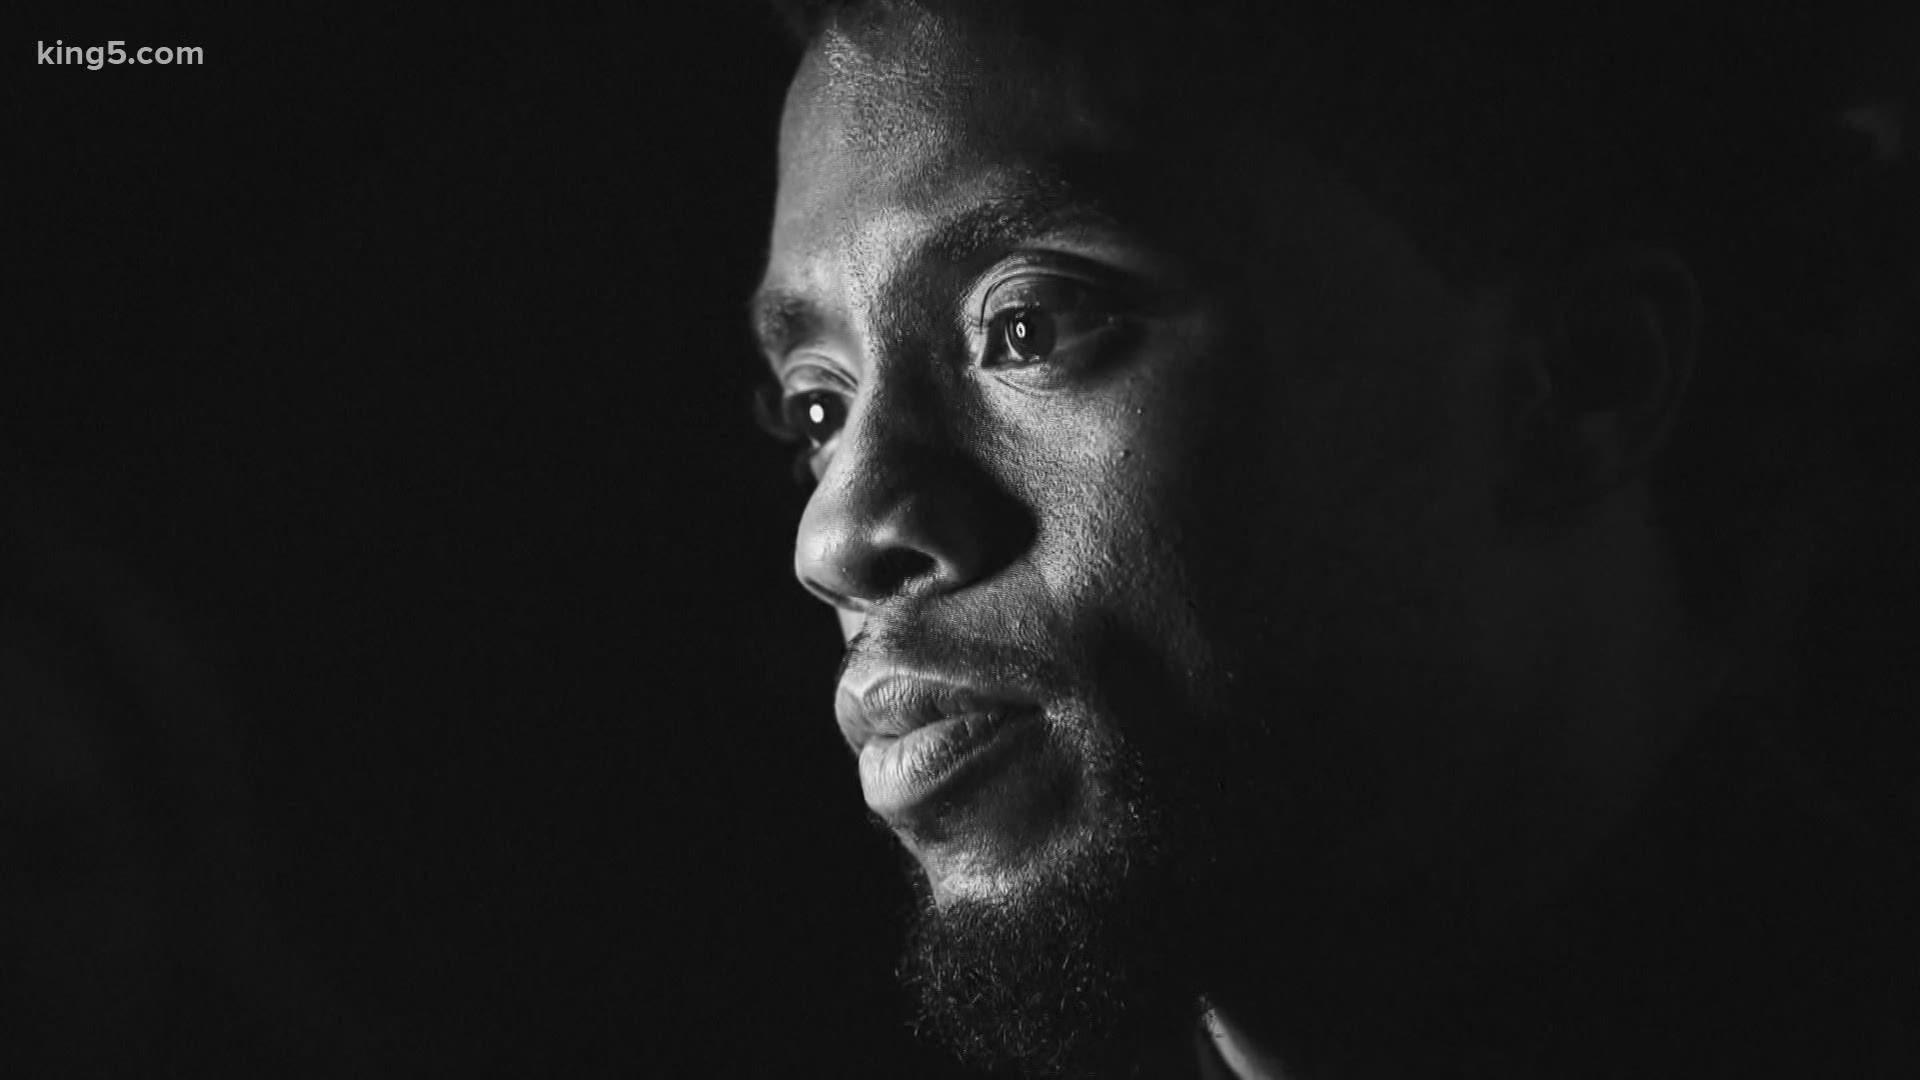 Chadwick Boseman S Death Spotlights Colon Cancer Among Black Men King5 Com